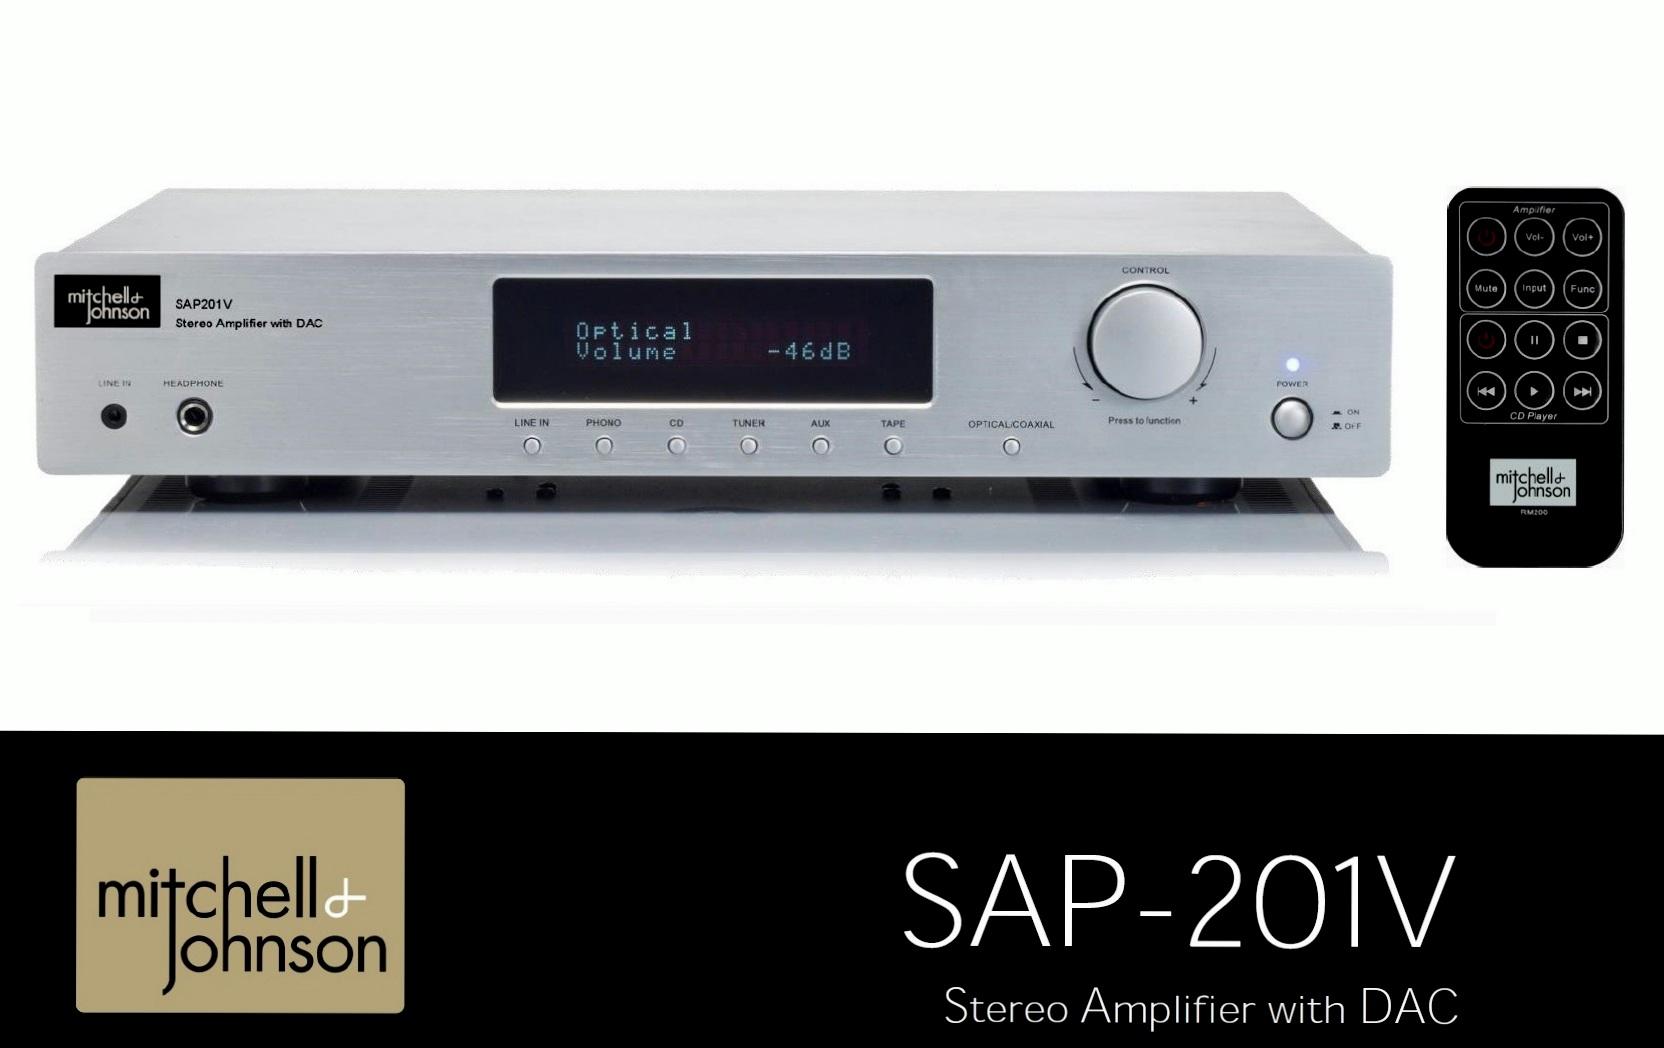 Mitchell & Johnson SAP-201V Barevné provedení: stříbrné